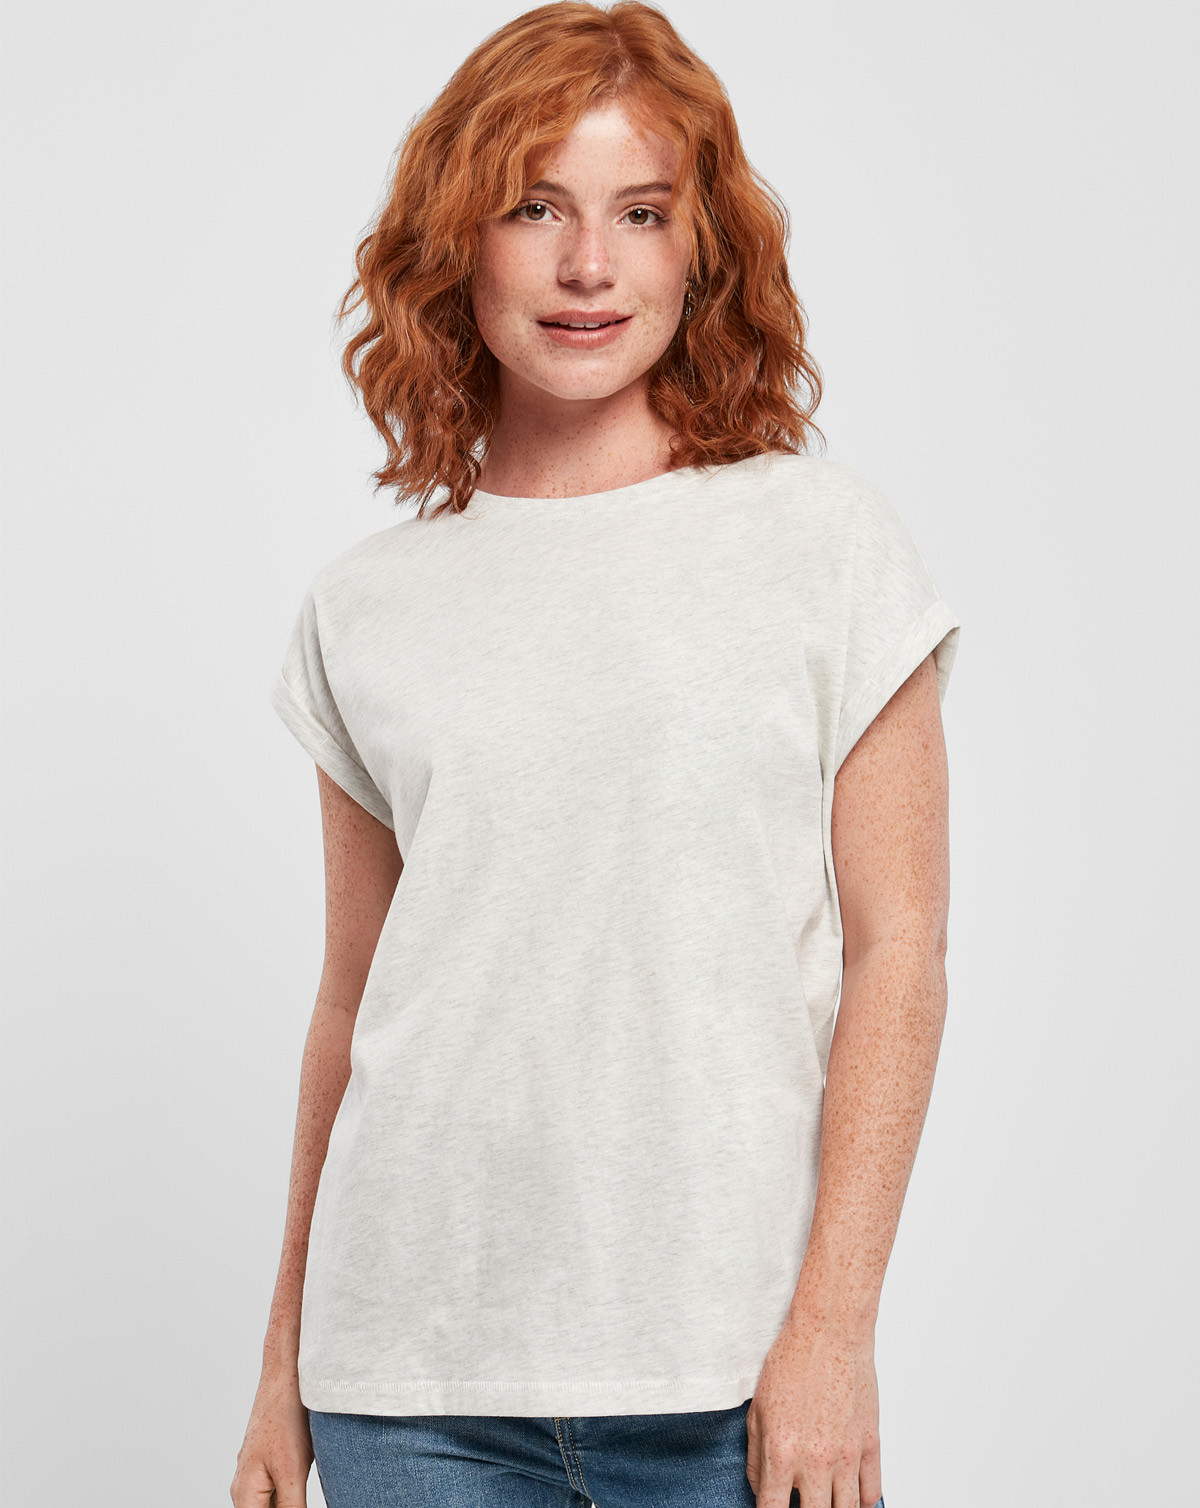 Urban Classics Ladies Extended Shoulder Tee (Ljusgrå, 2XL)